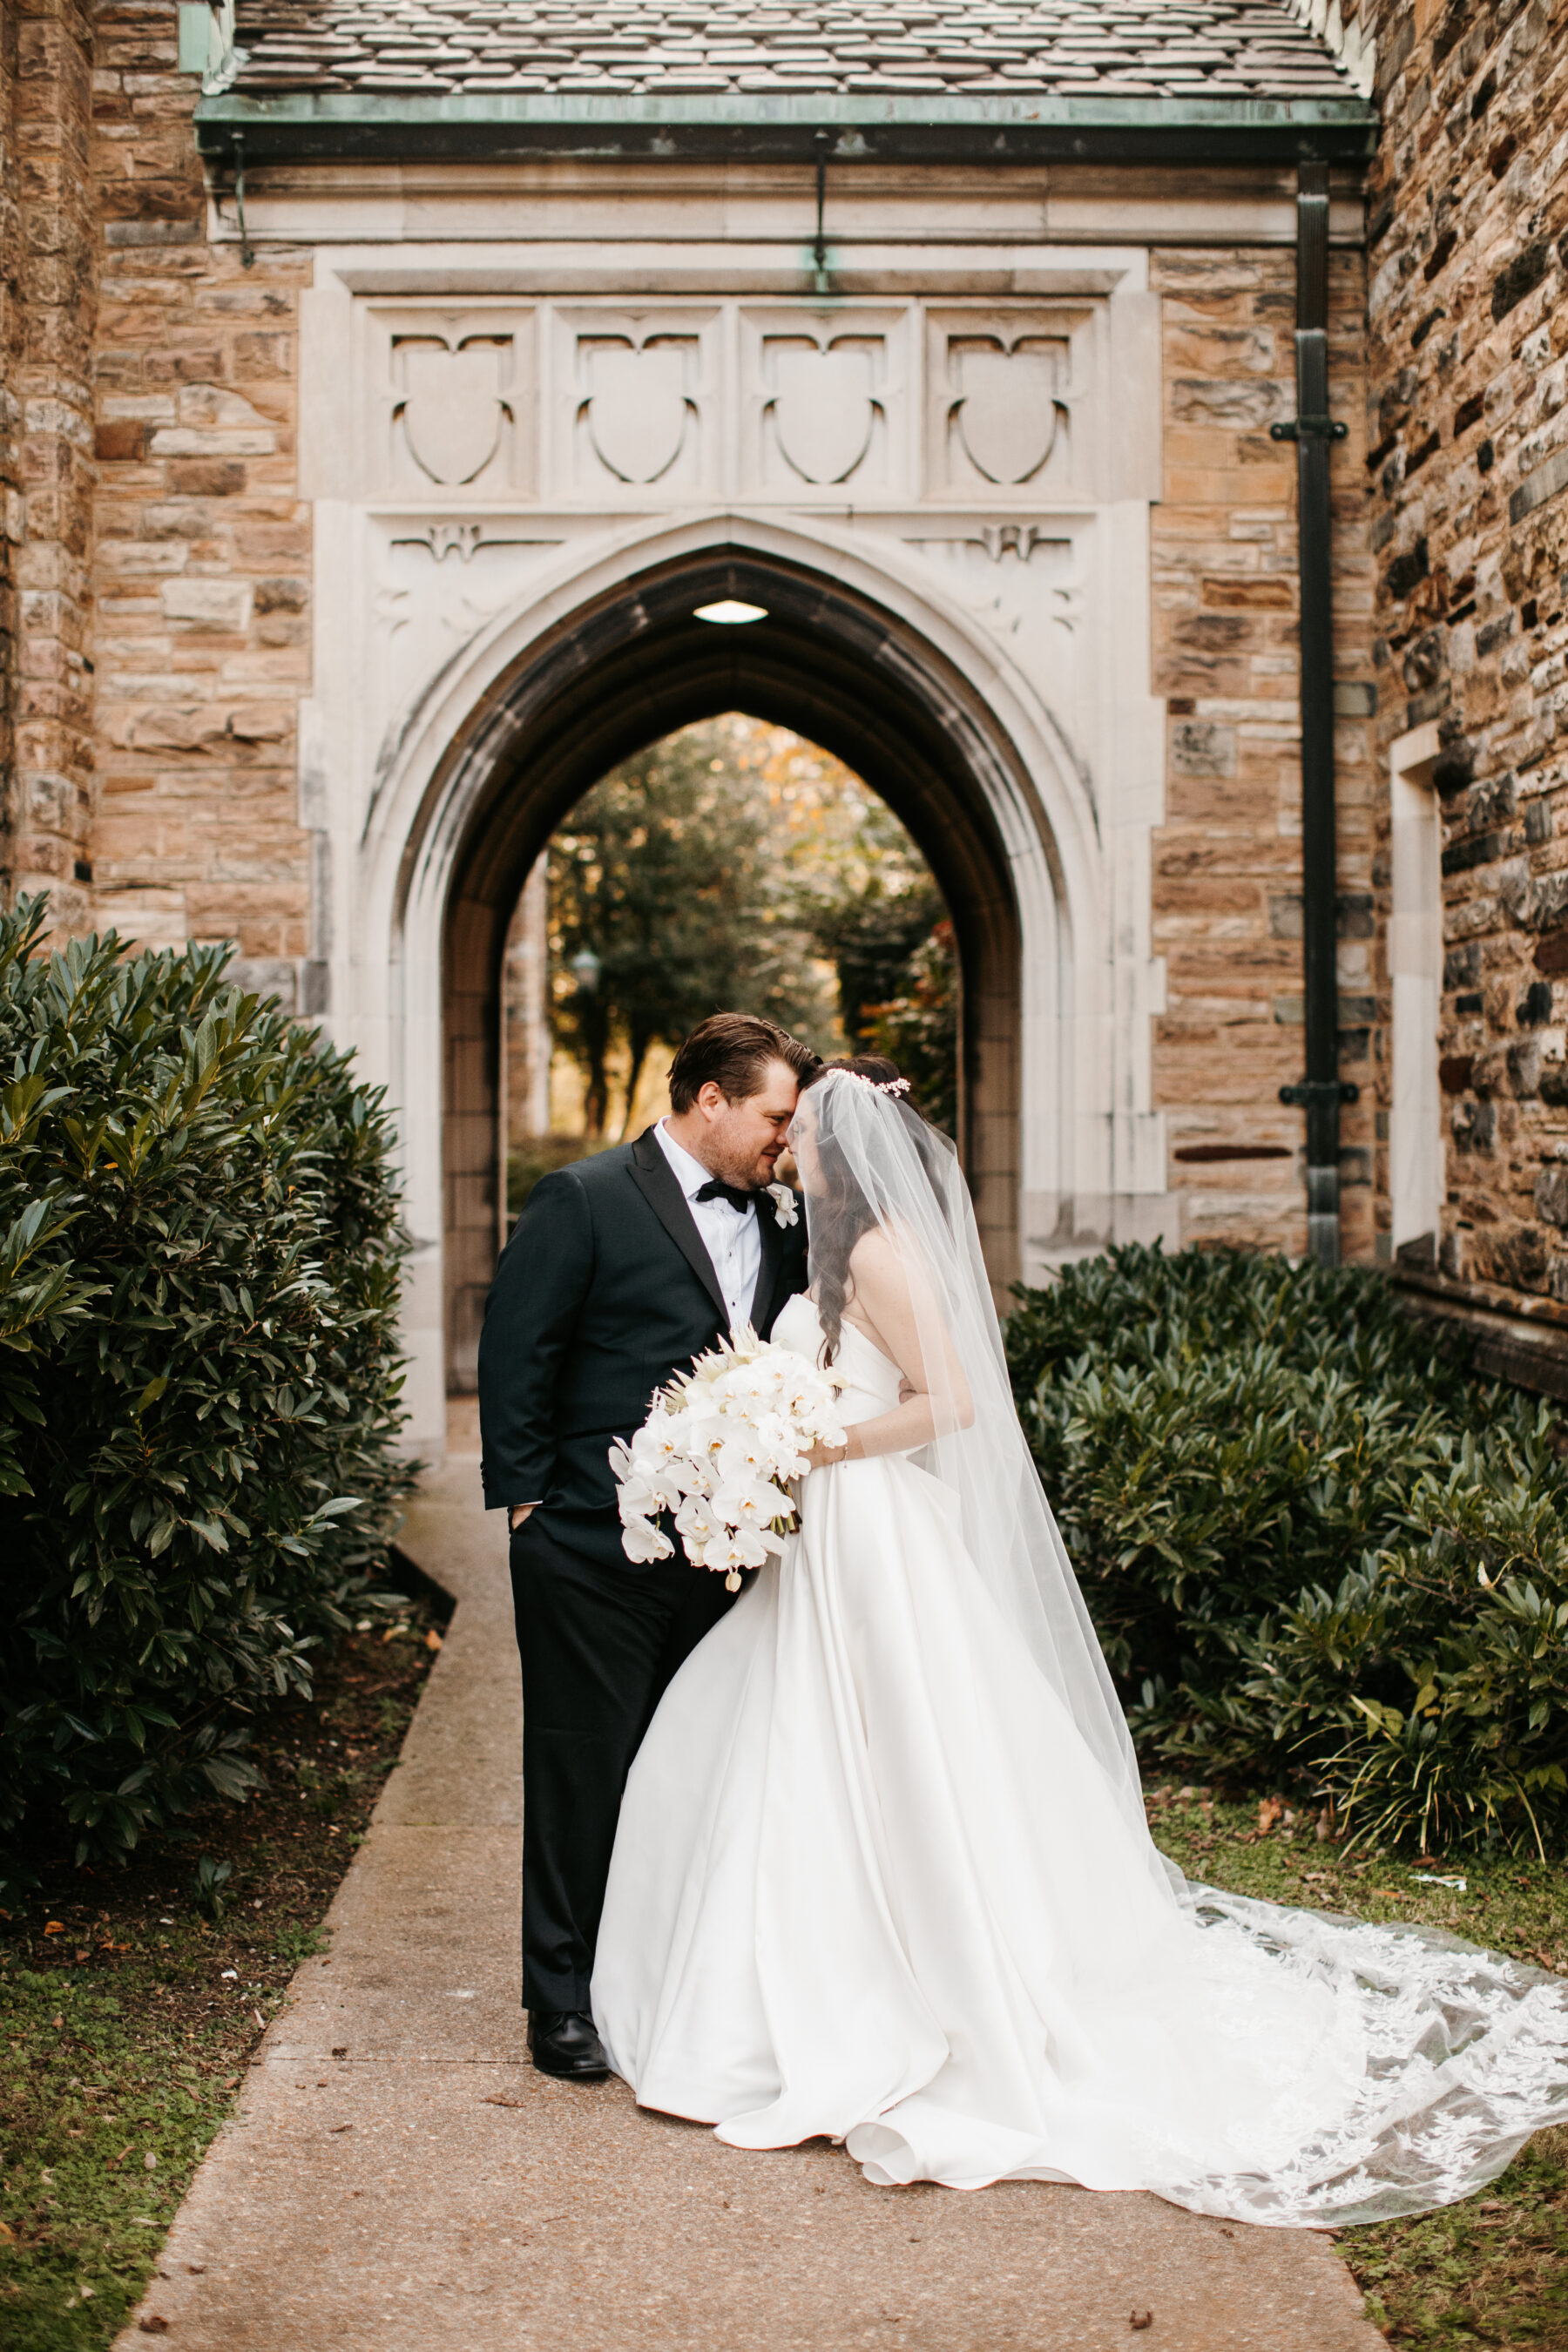 Modern wedding with statement flowers from LMA Designs | Nashville Bride Guide